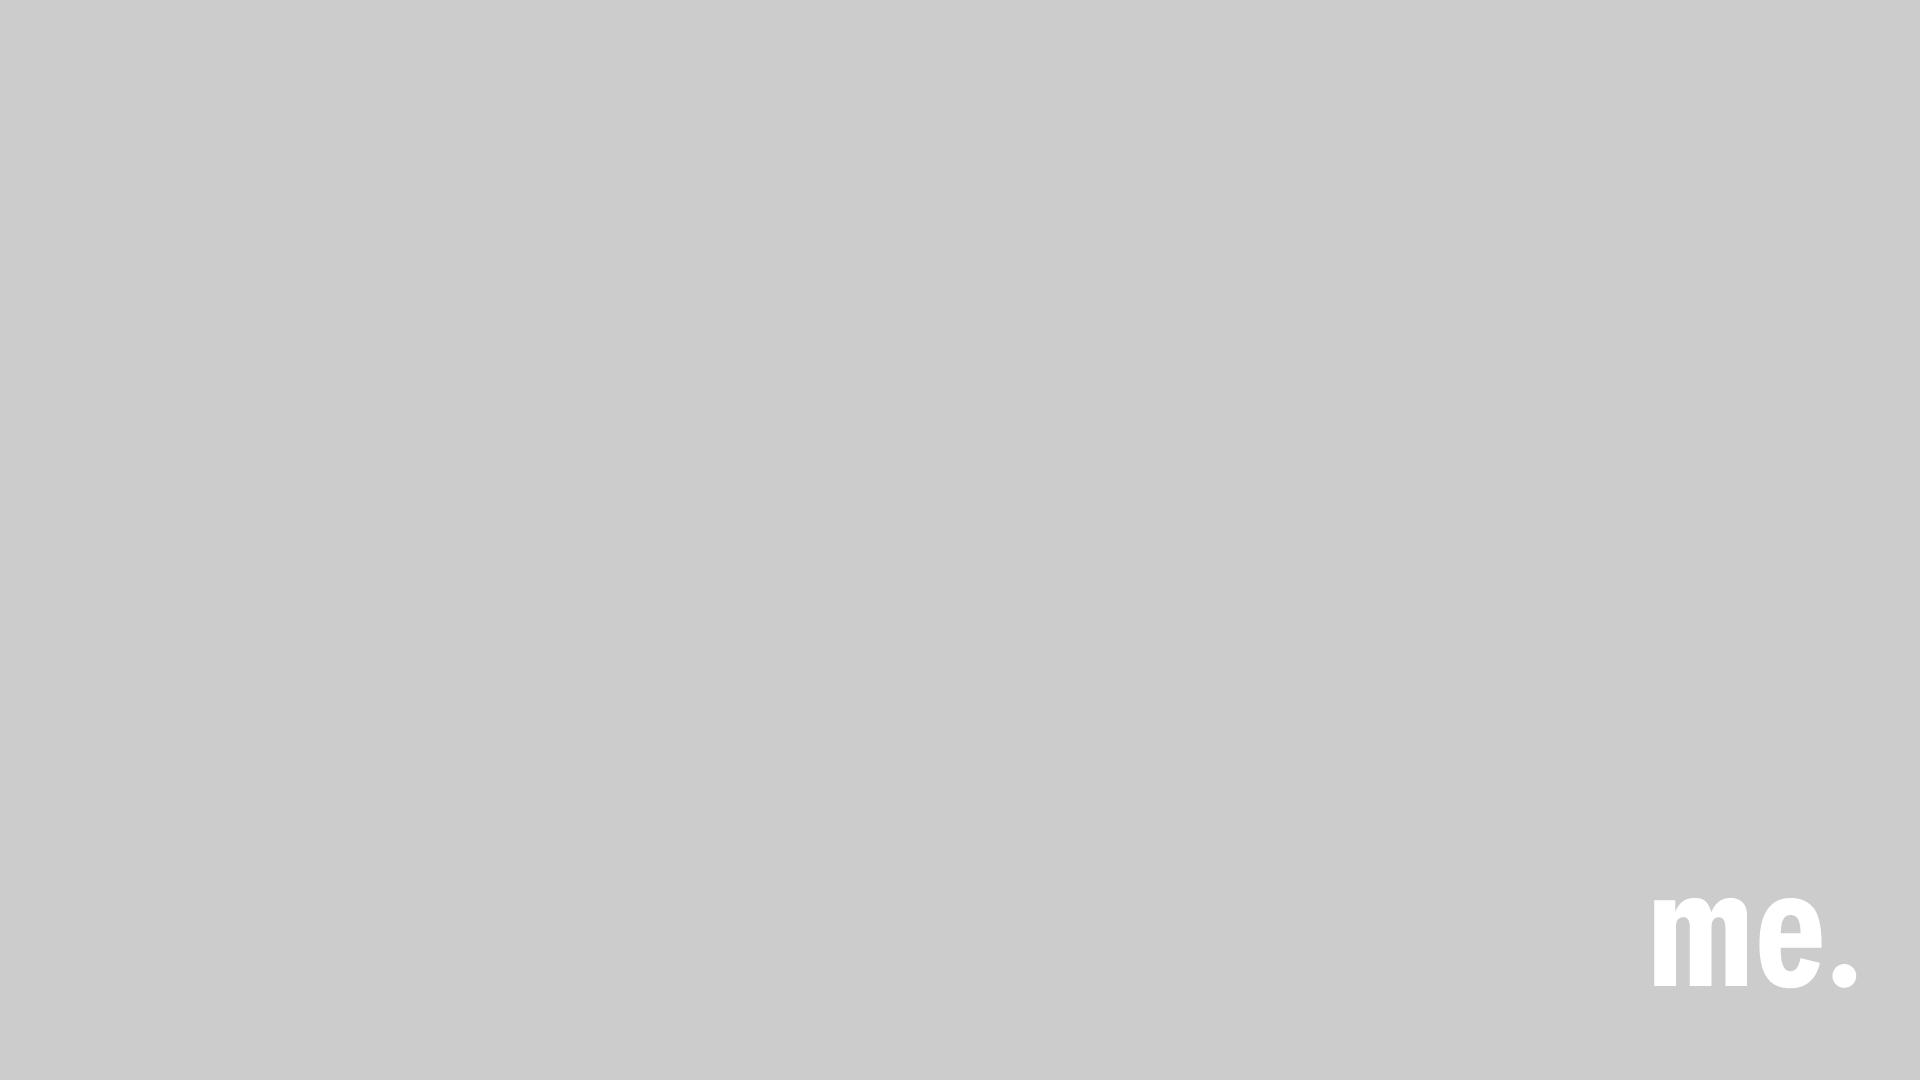 8. Jason Aldean - 17,578,651.96 US-Dollar